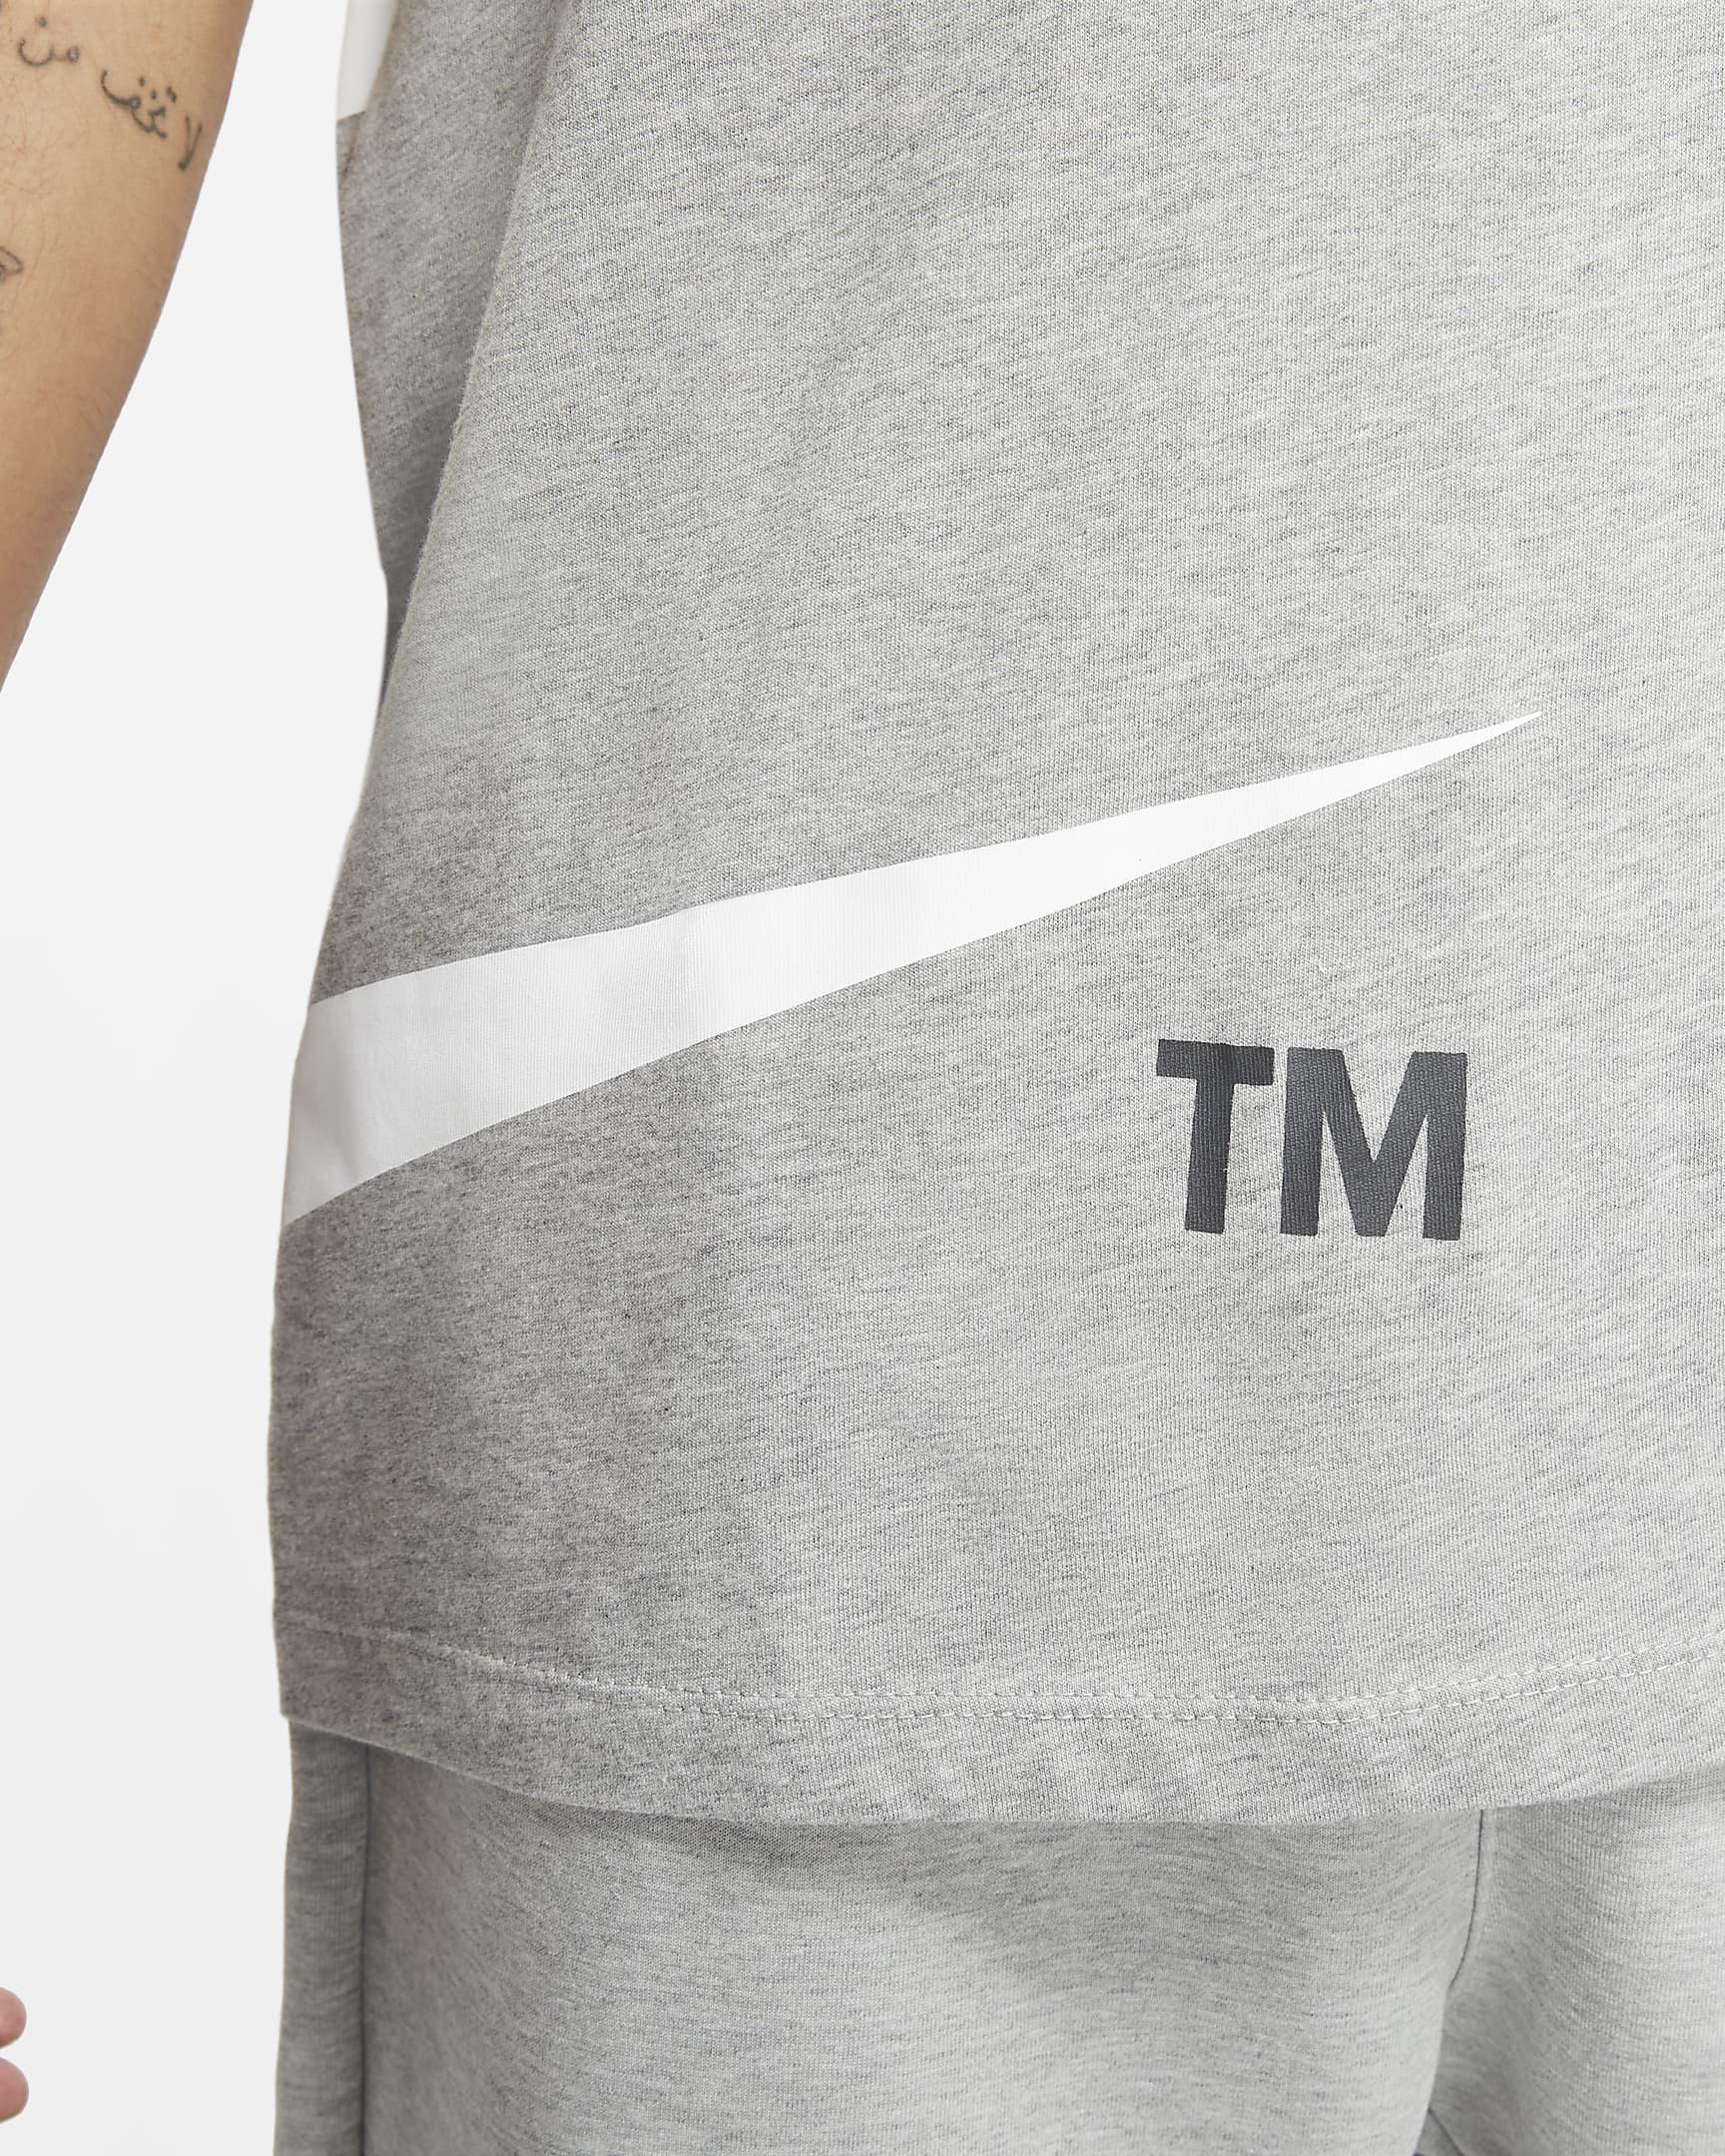 nike-sportswear-mens-t-shirt-zTB7SW-2.png